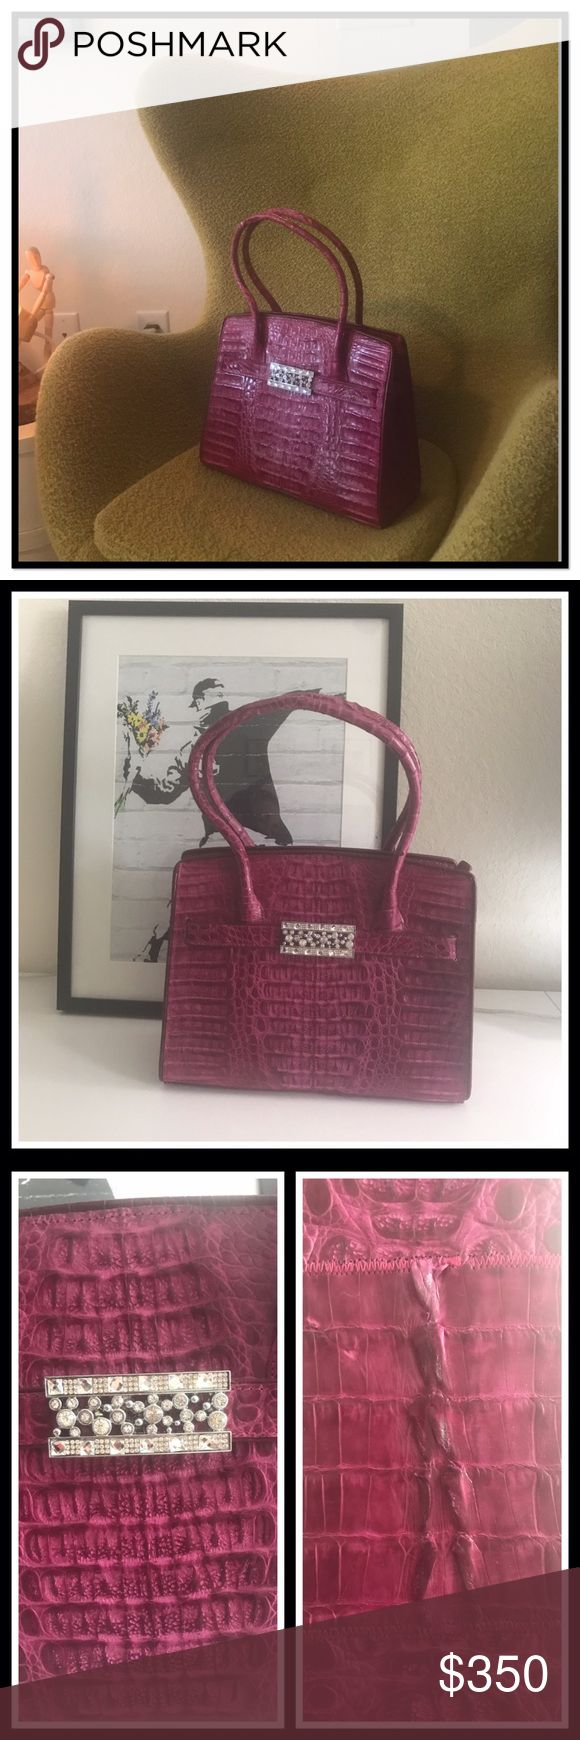 newluxury genuine crocodile leather handbag luxury alert high